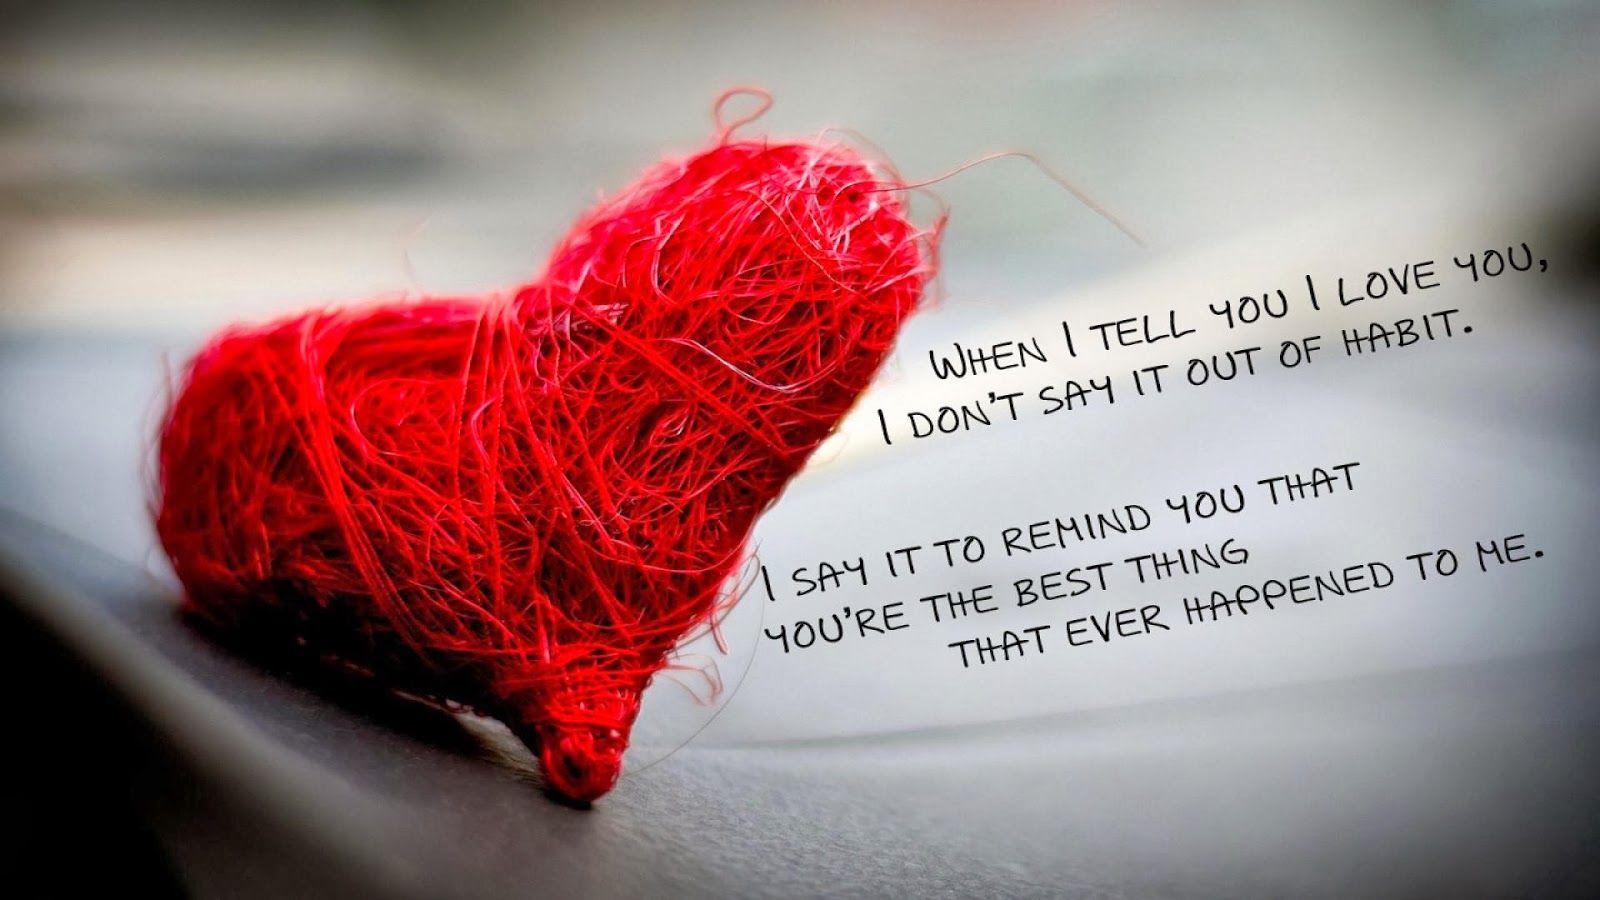 Inspiring Love Quotes Images U2013 Inspiring Images